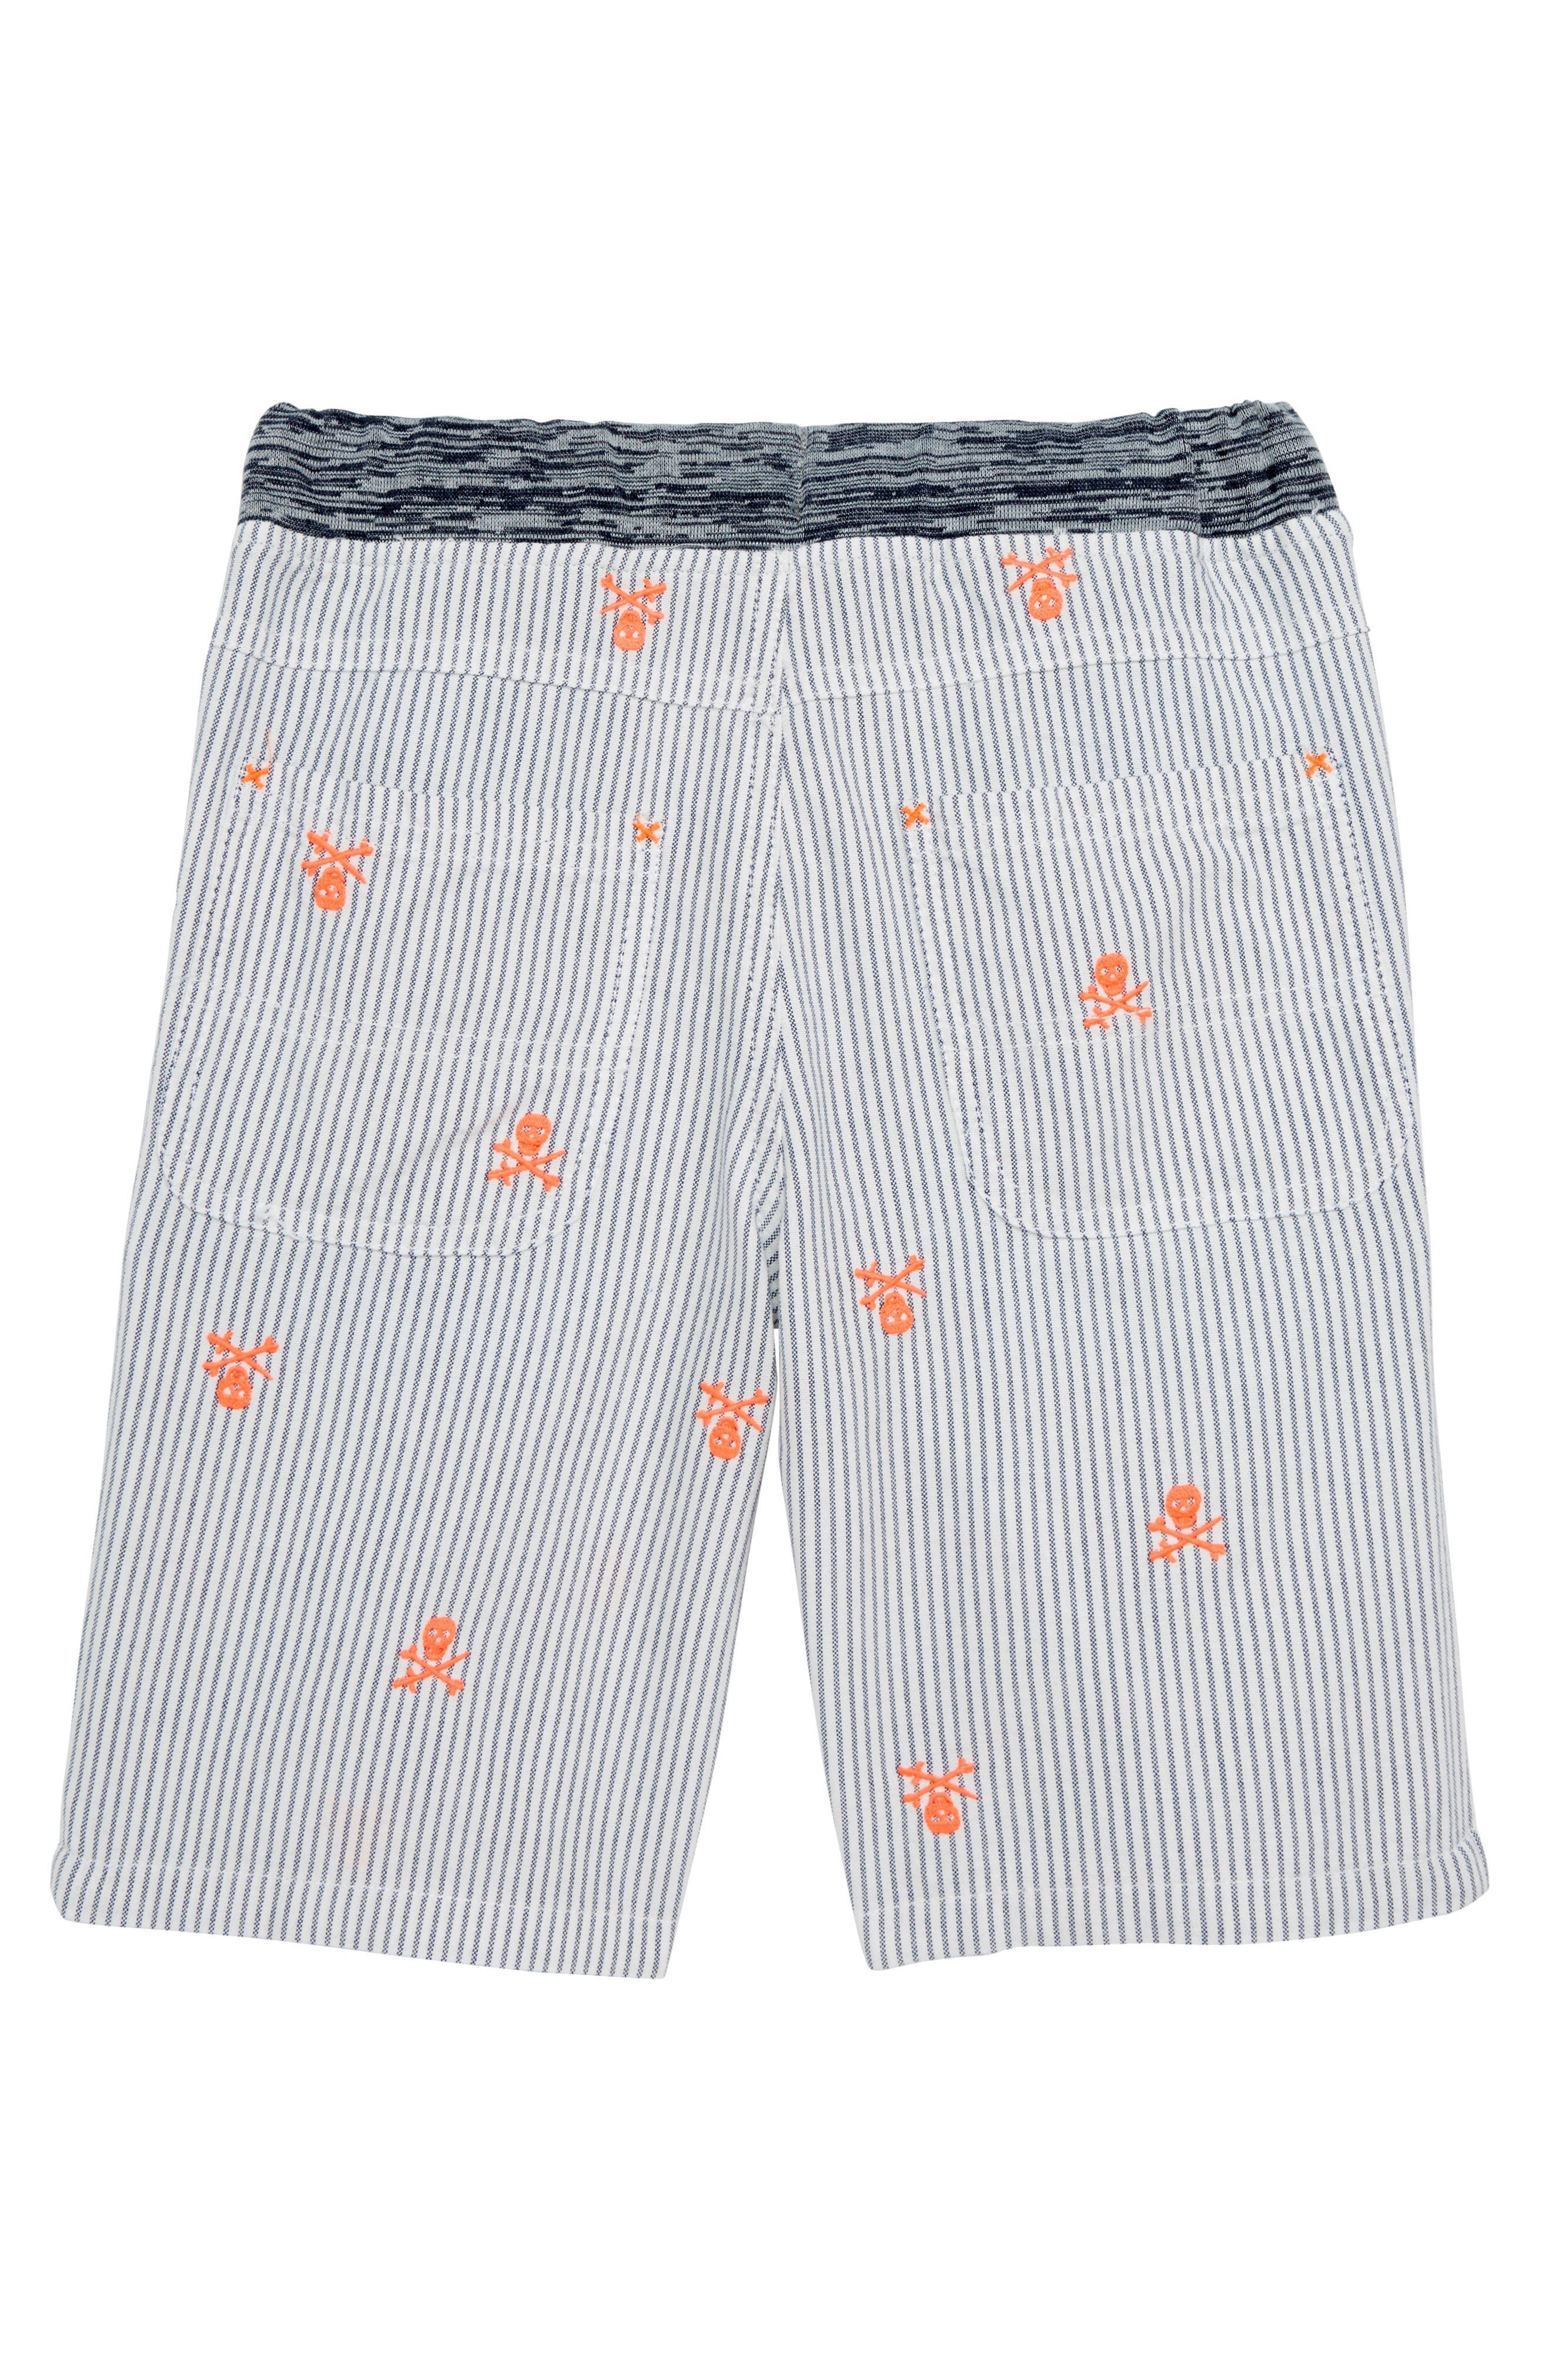 Rib Waist Shorts,                             Alternate thumbnail 3, color,                             Beacon Blue/ Ecru Skulls